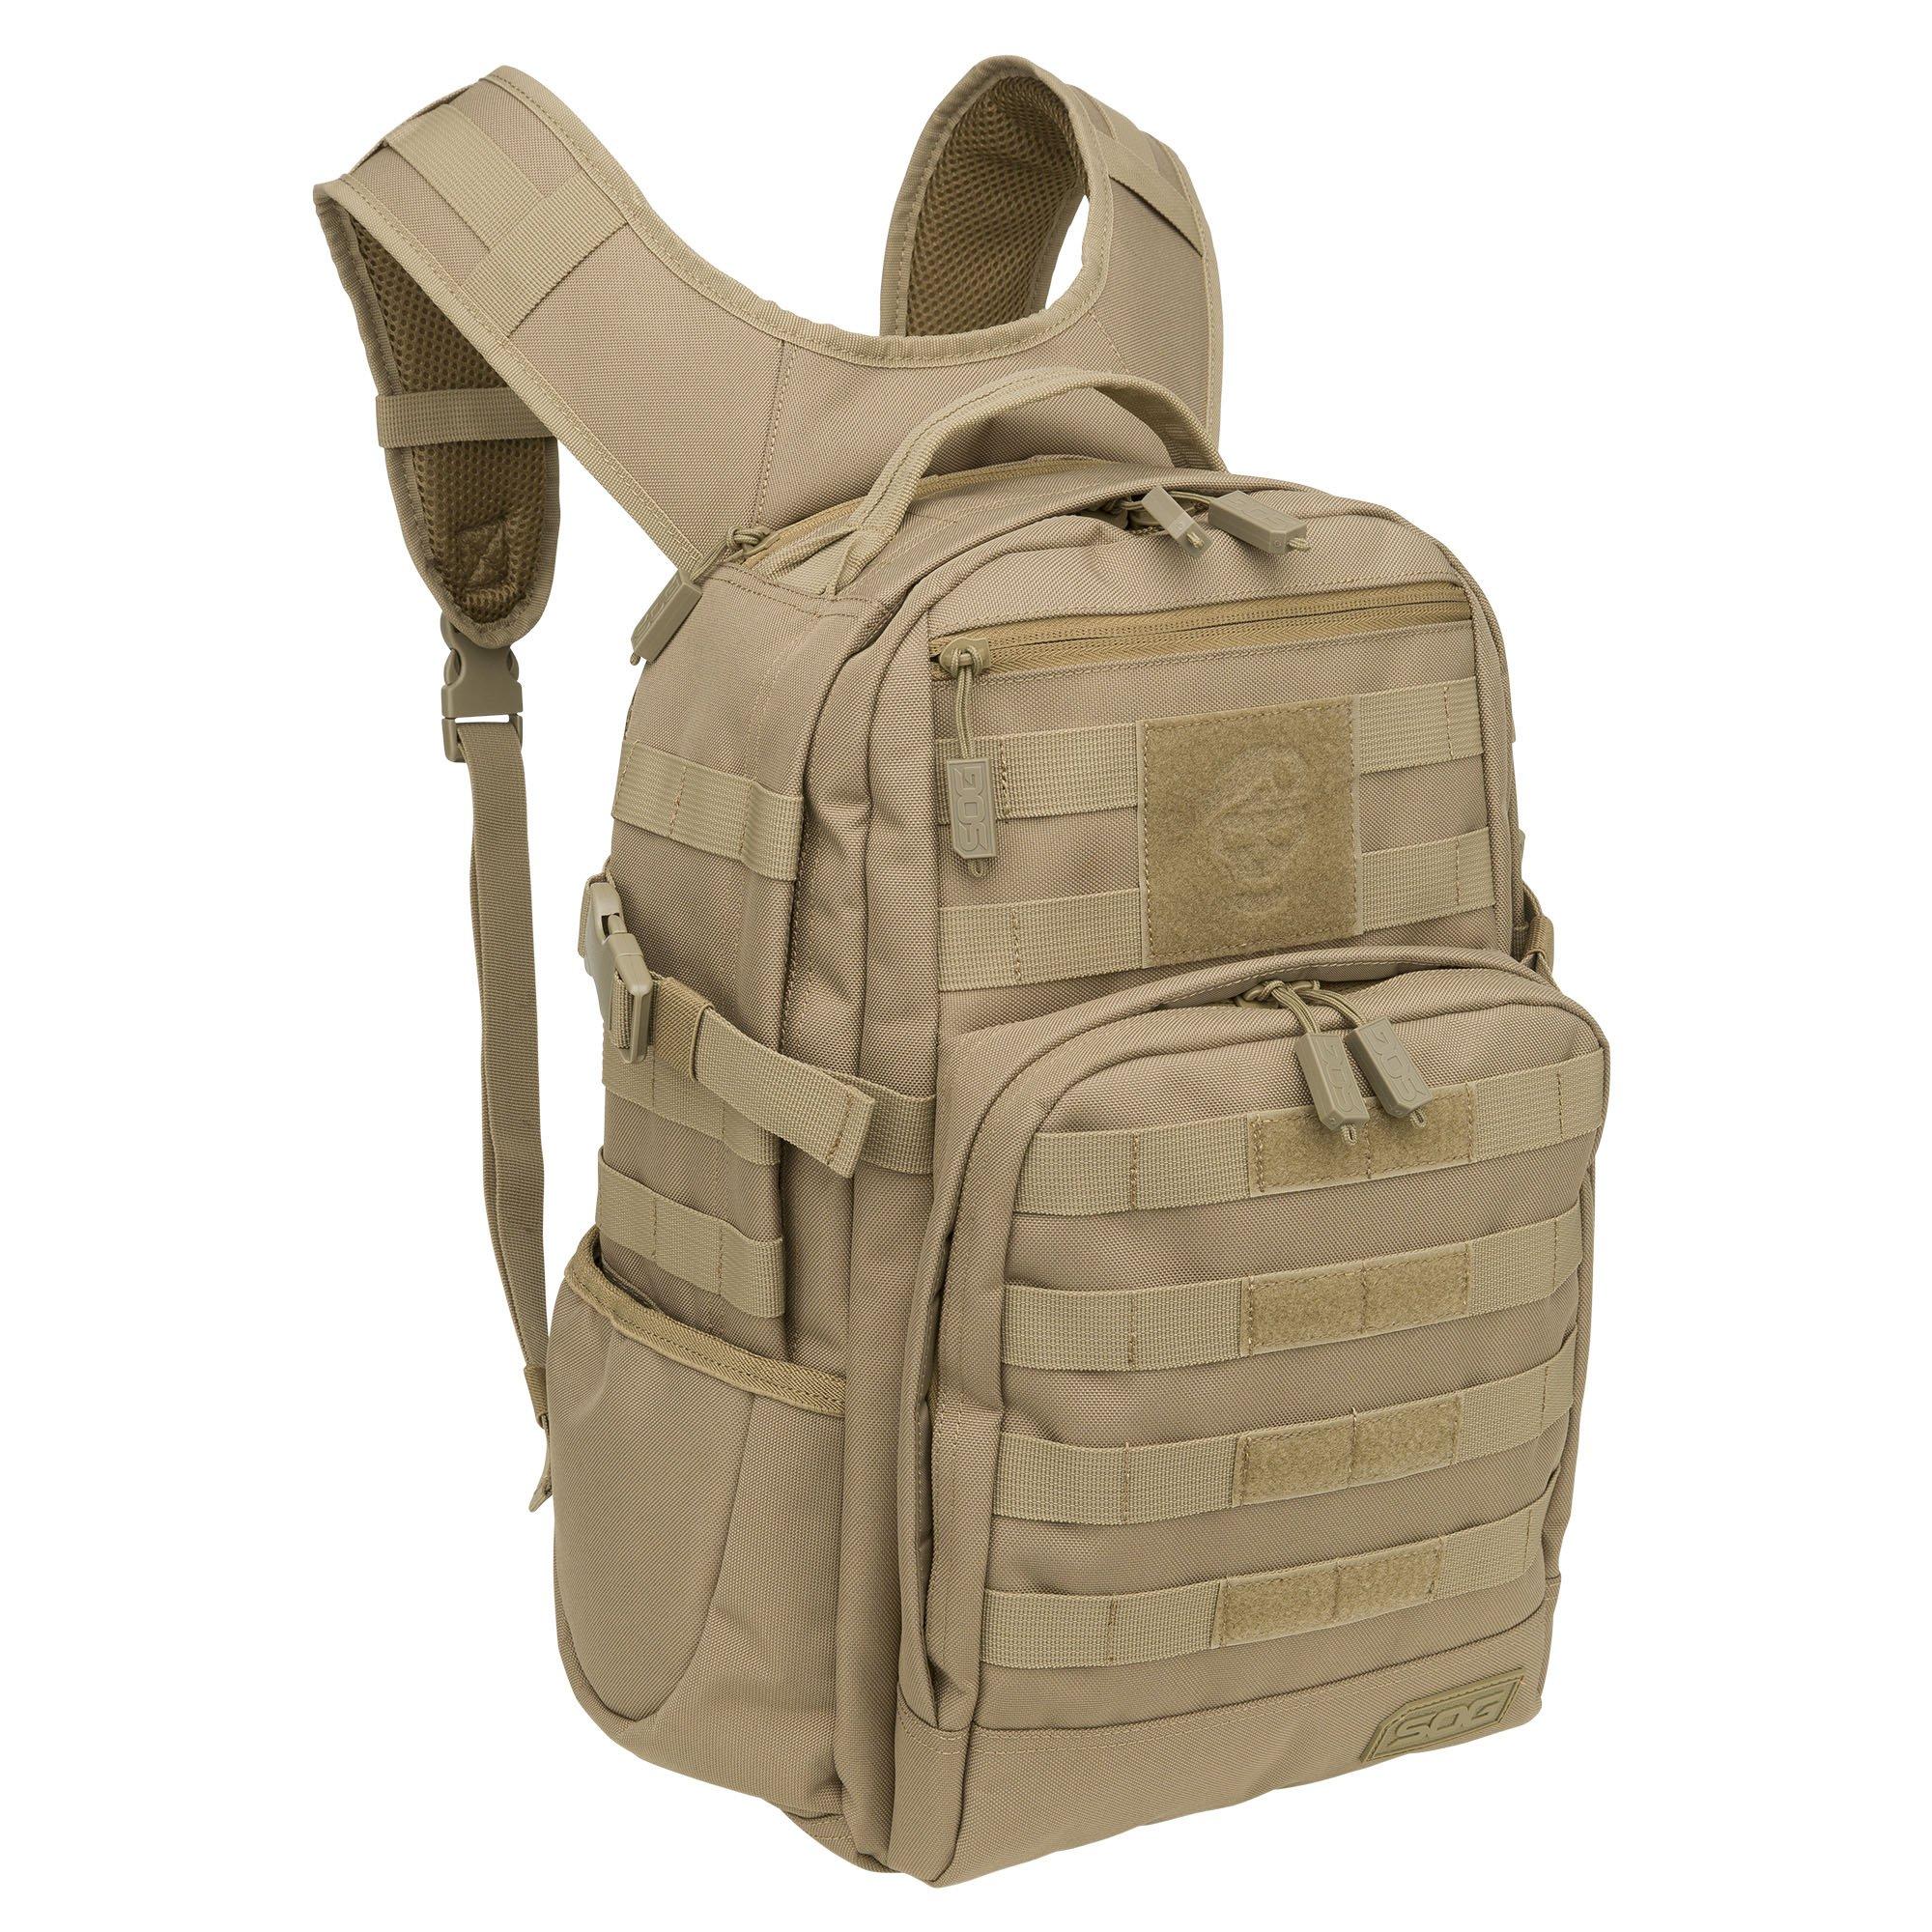 SOG Ninja Tactical Day Pack, 24.2-Liter, Coyote